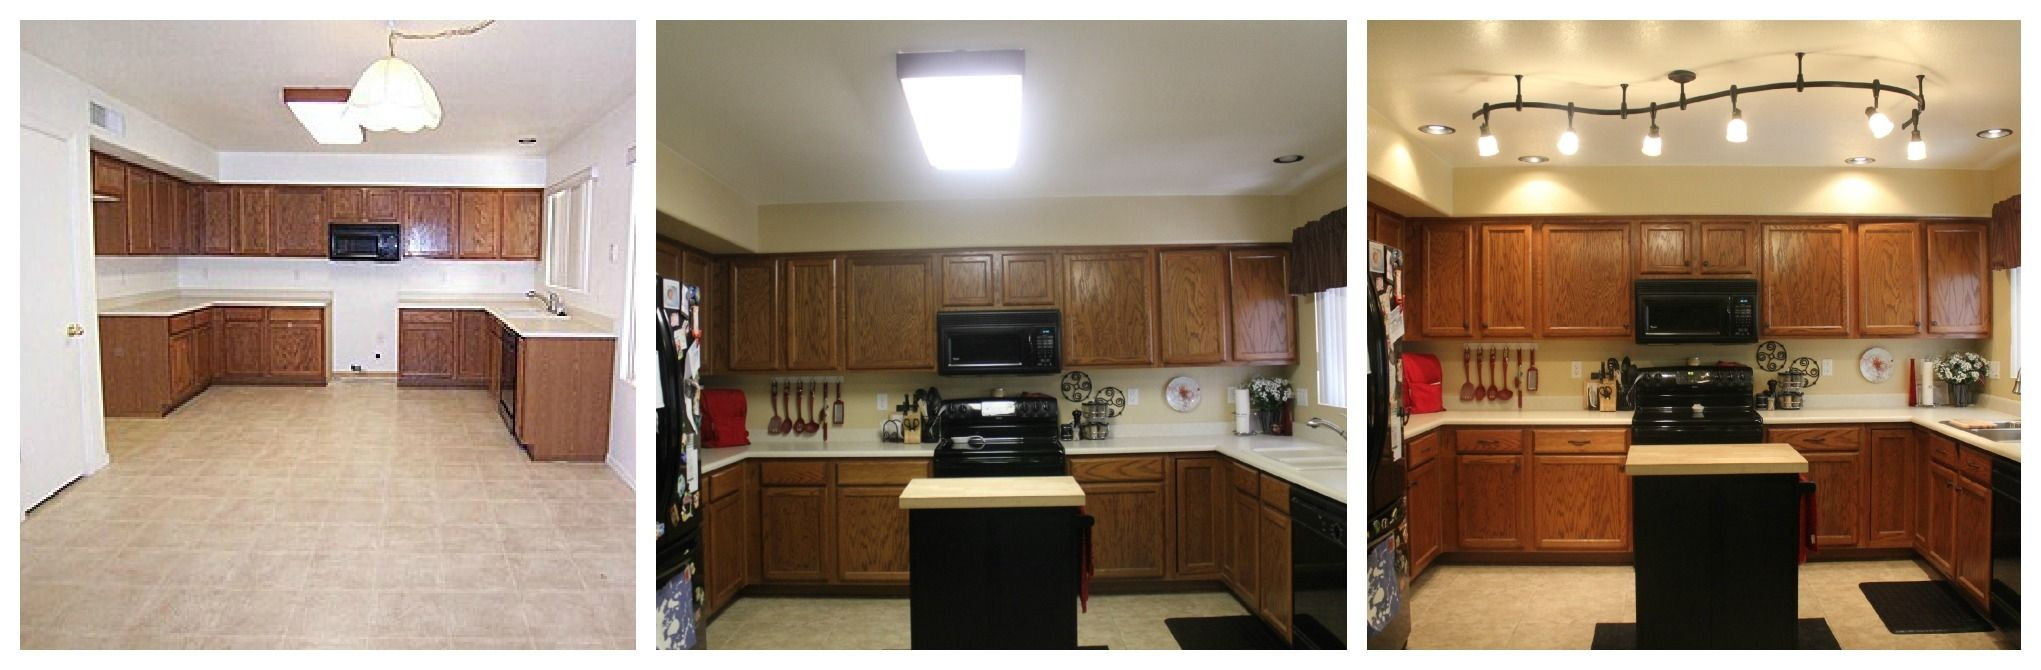 Kitchen Fluorescent Light Alternative